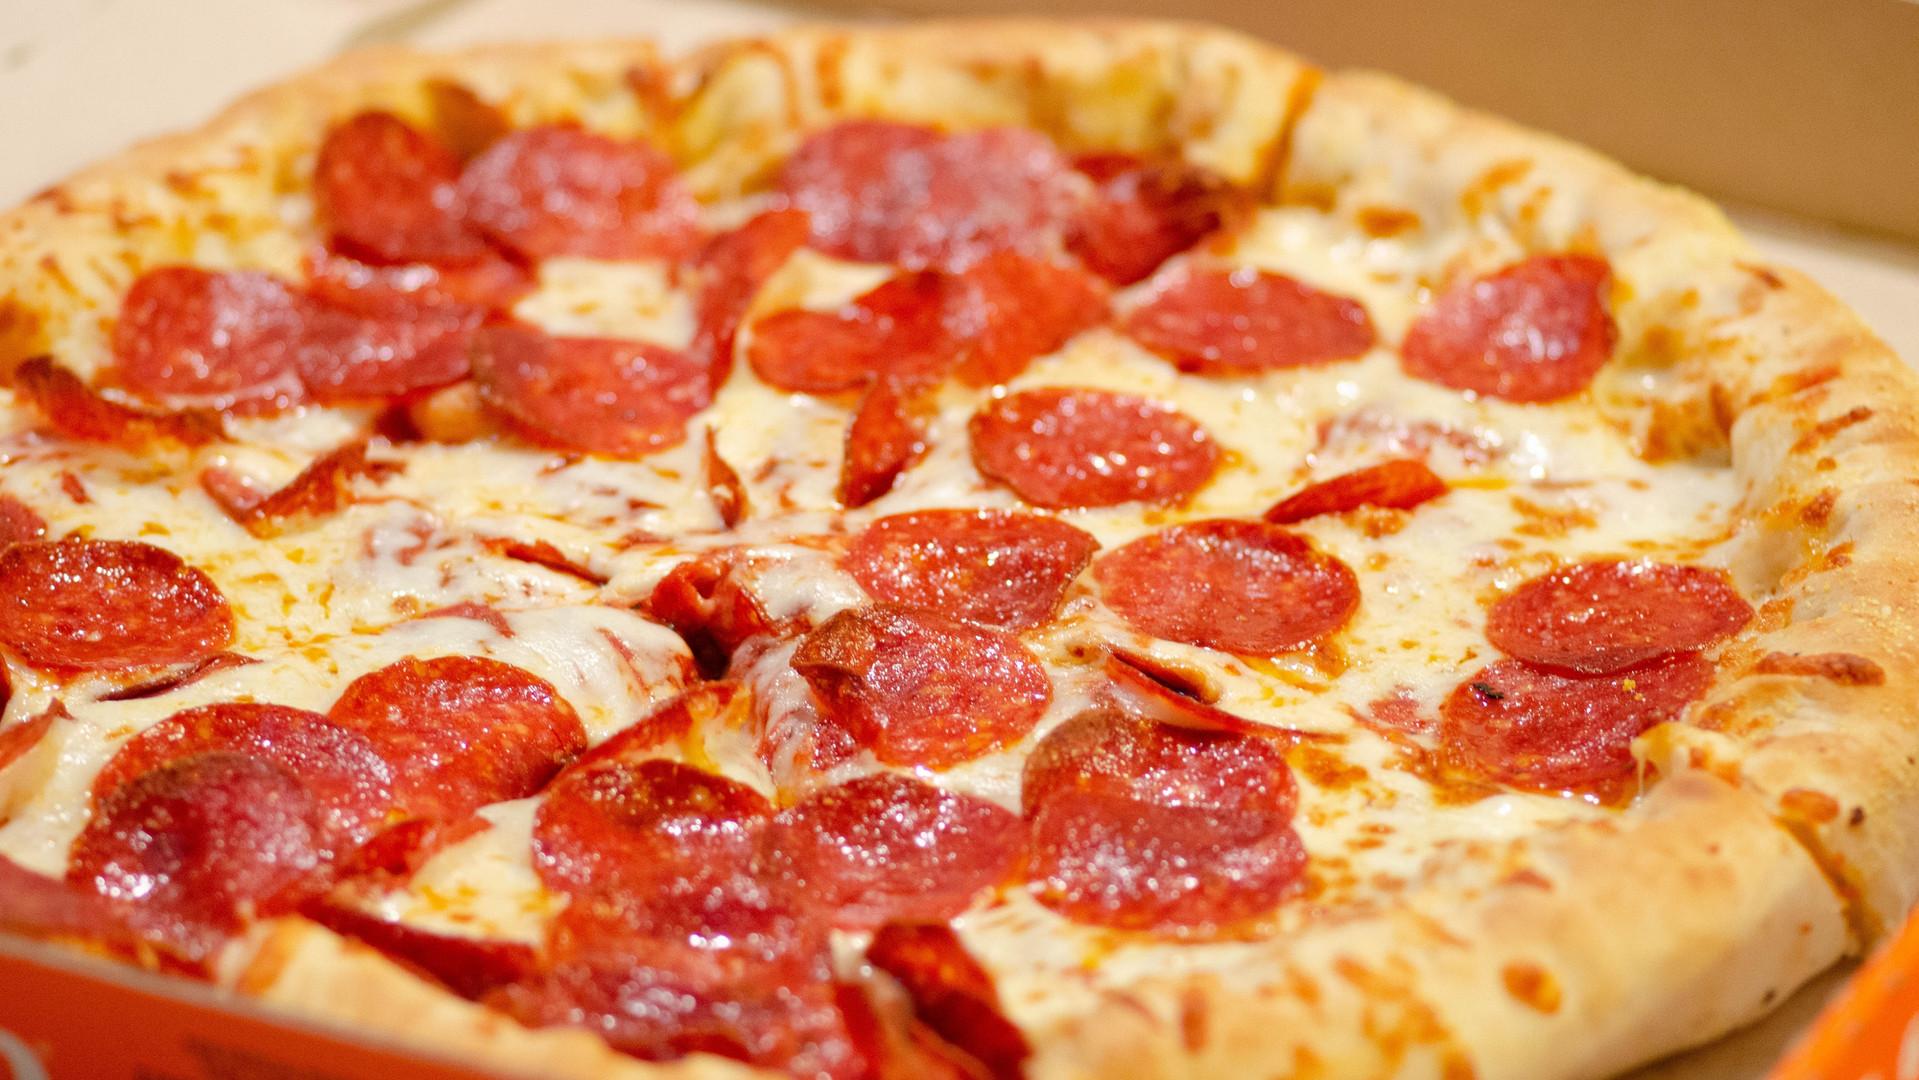 Emotional binge eating (weight soared to 350)